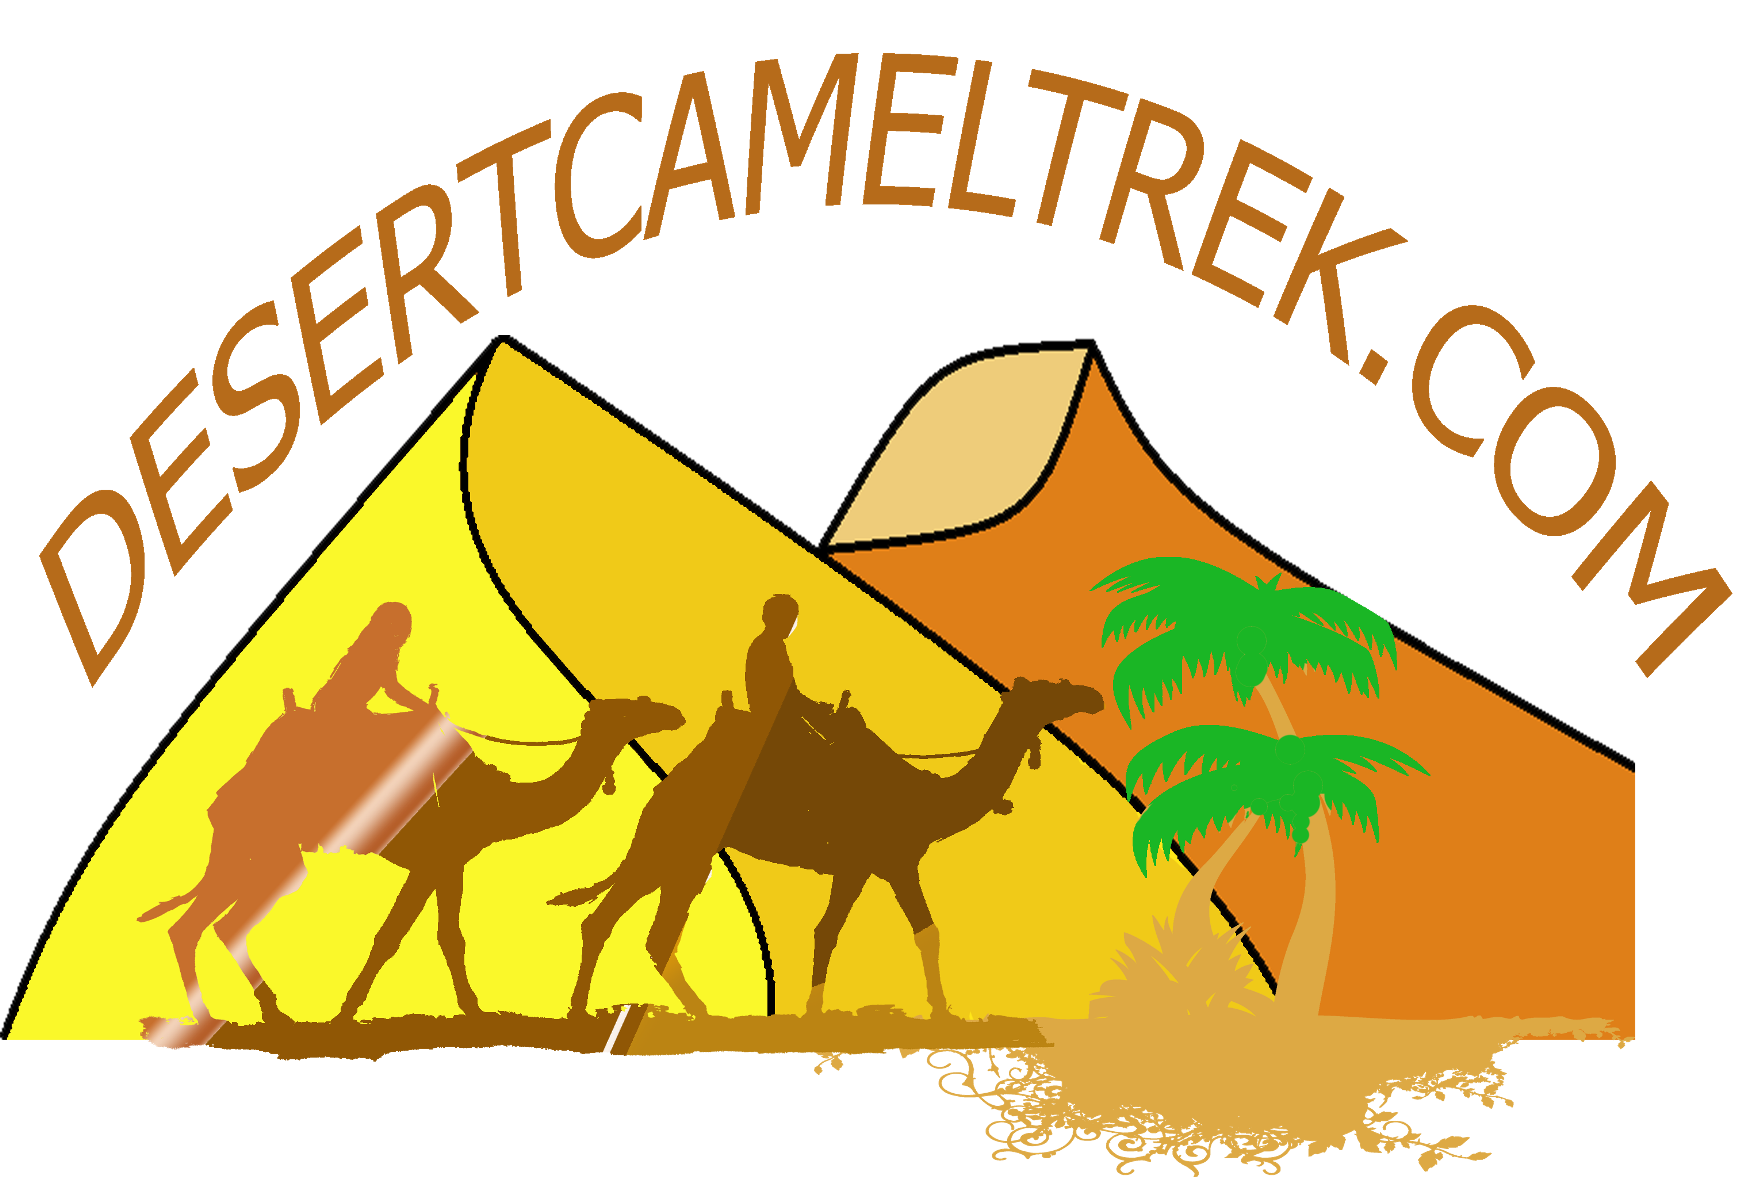 svg library download desert camel trek